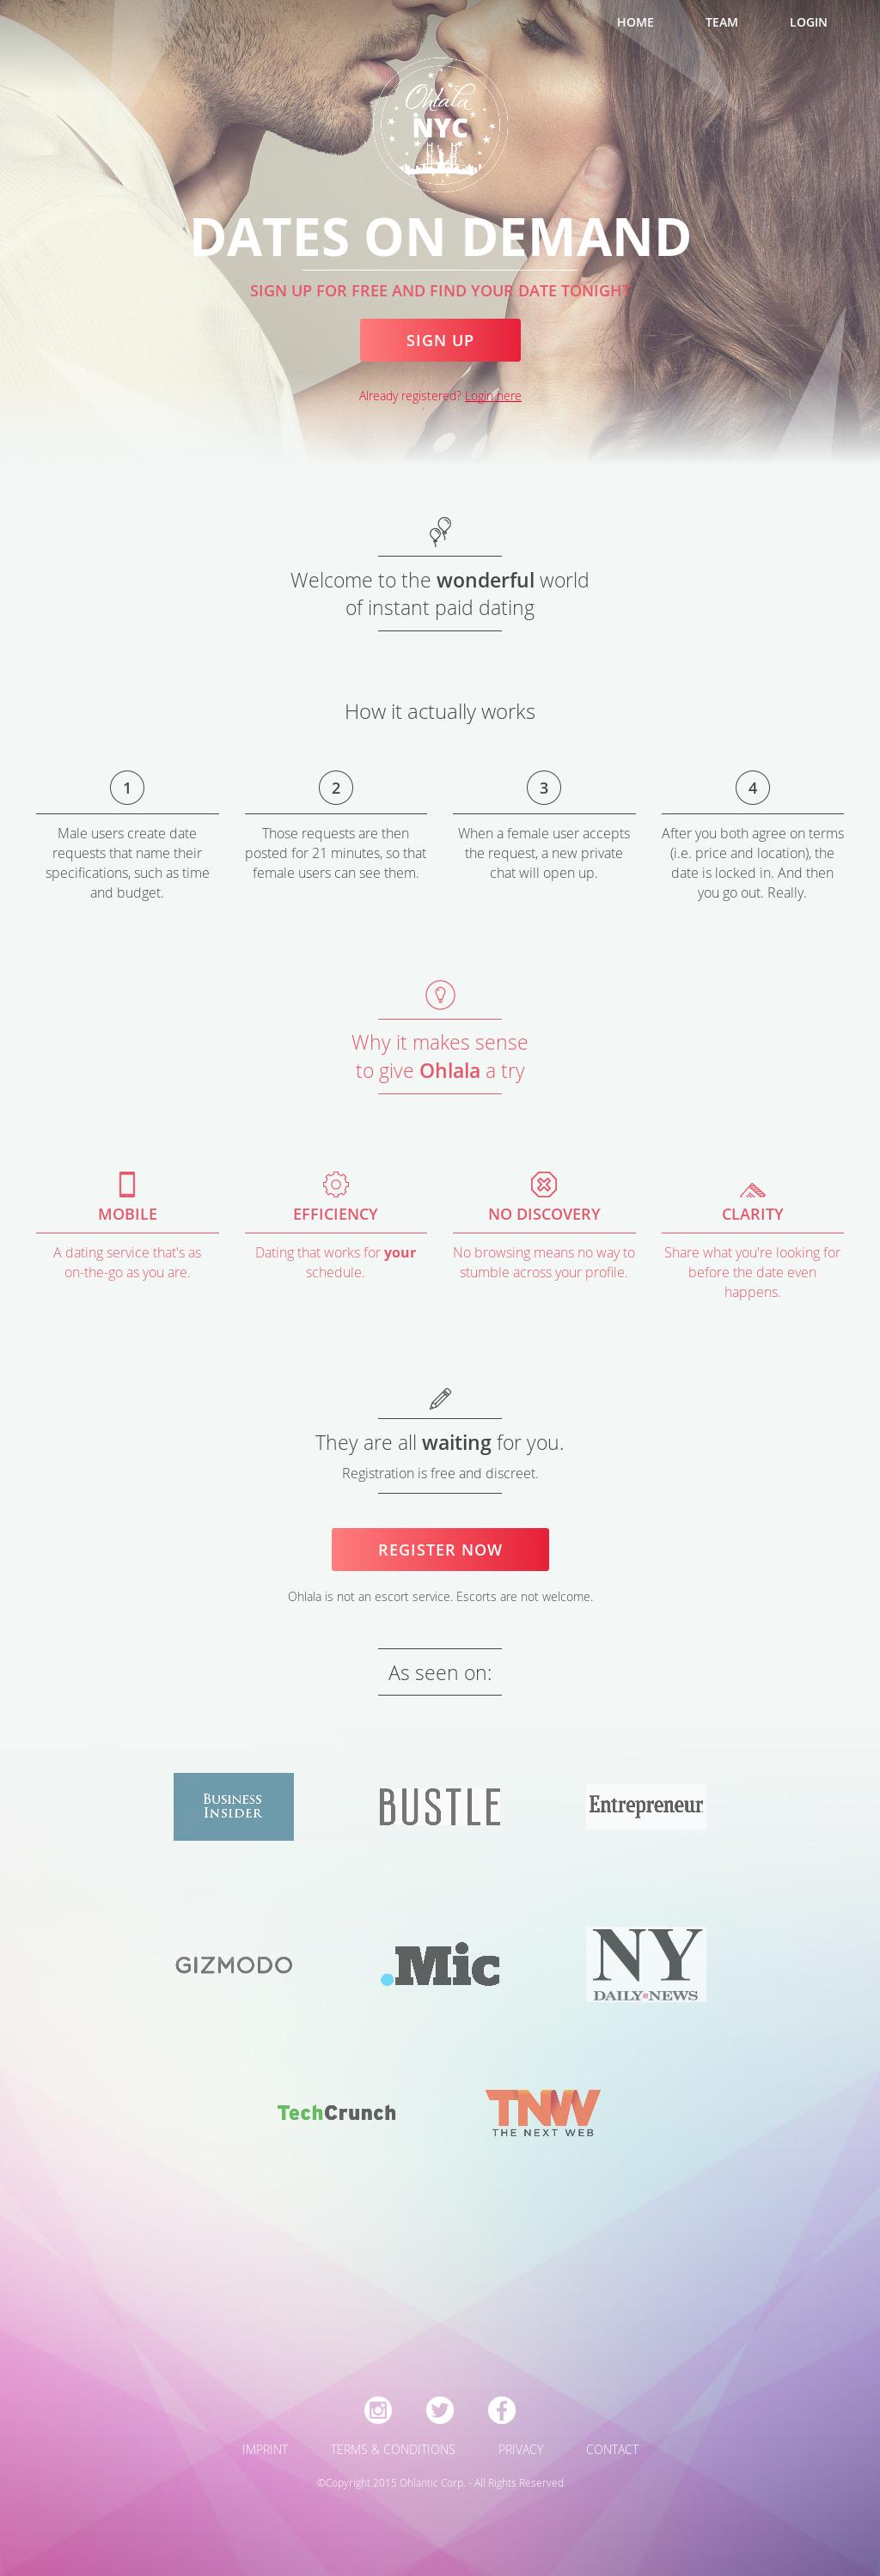 Web-App Ohlala website history